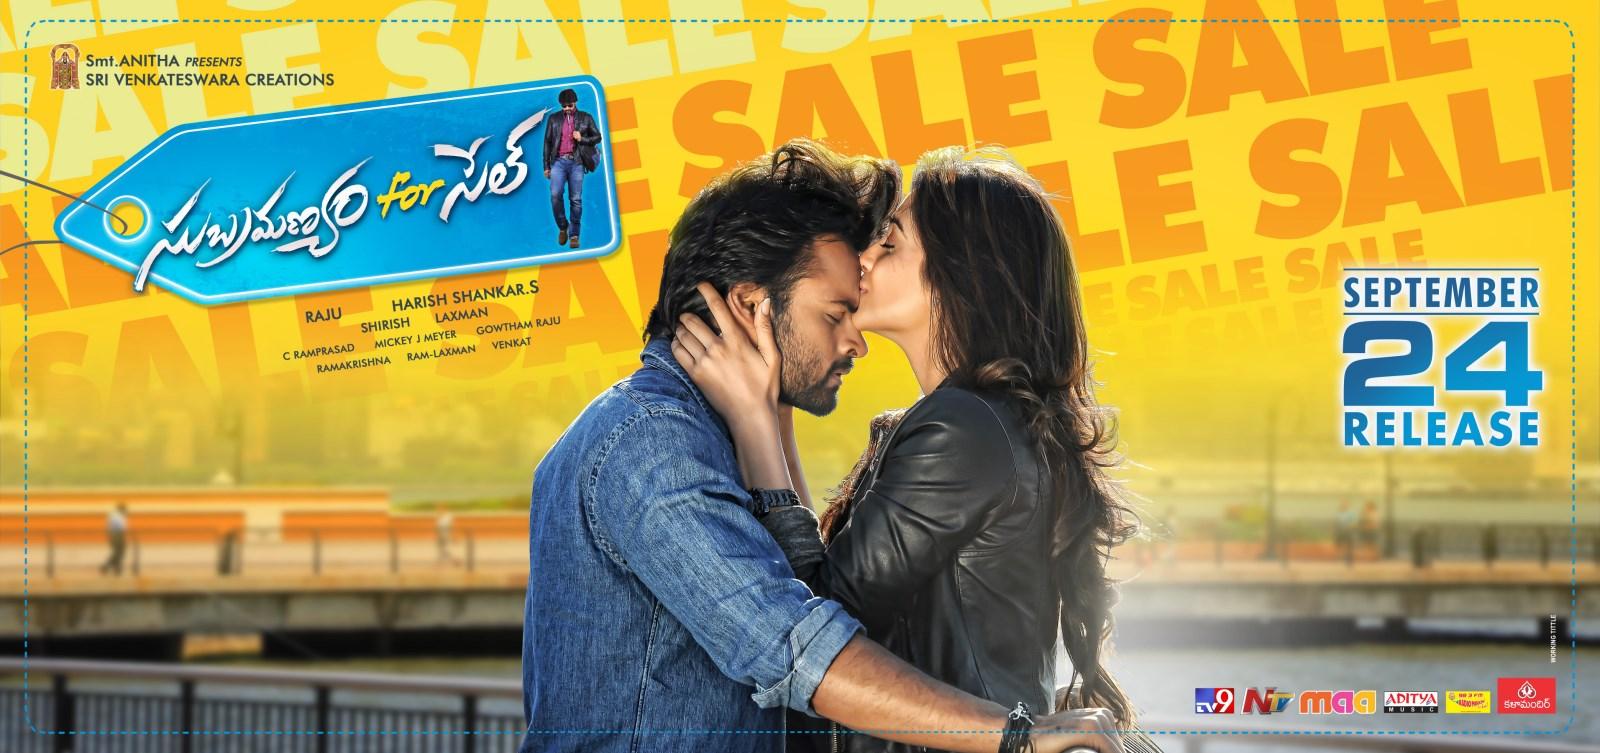 Sai Dharam Tej, Regina Cassandra in Subramanyam For Sale Movie Release Wallpapers